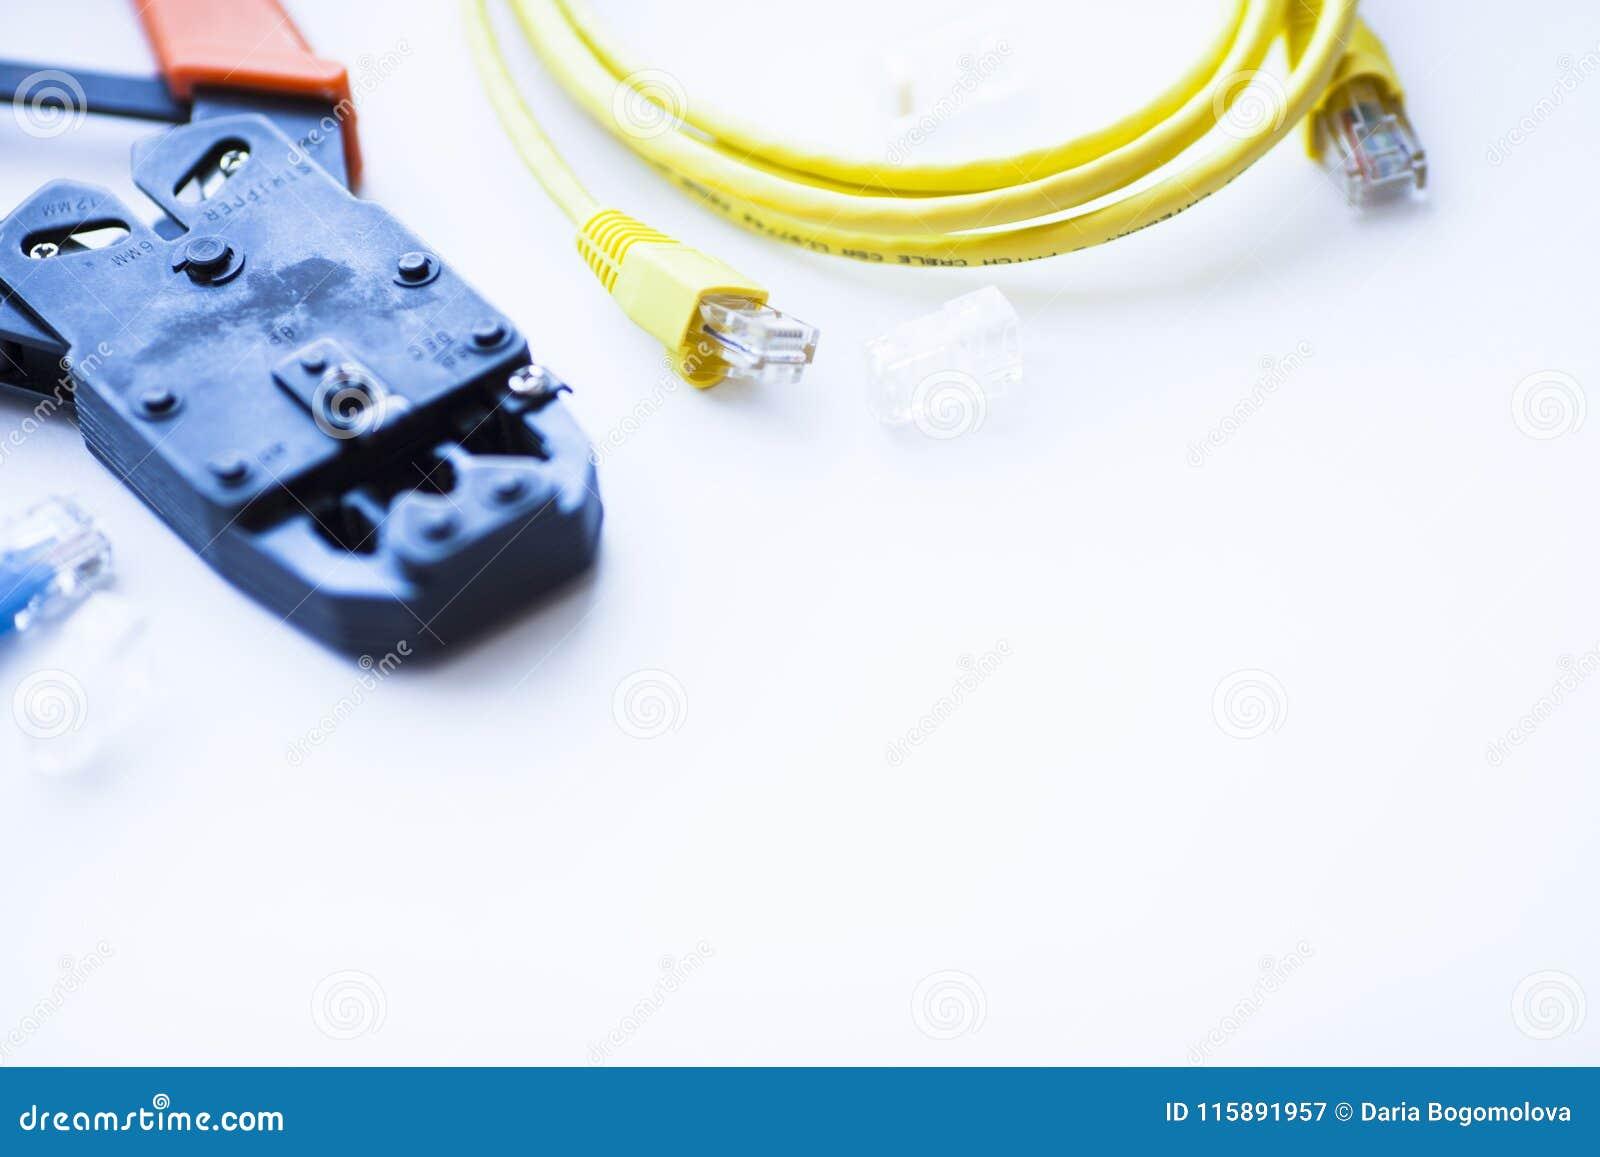 SKS e conceito da engenharia Grupo de conectores, de ethernet e de cabos do console, ferramenta do friso no fundo branco